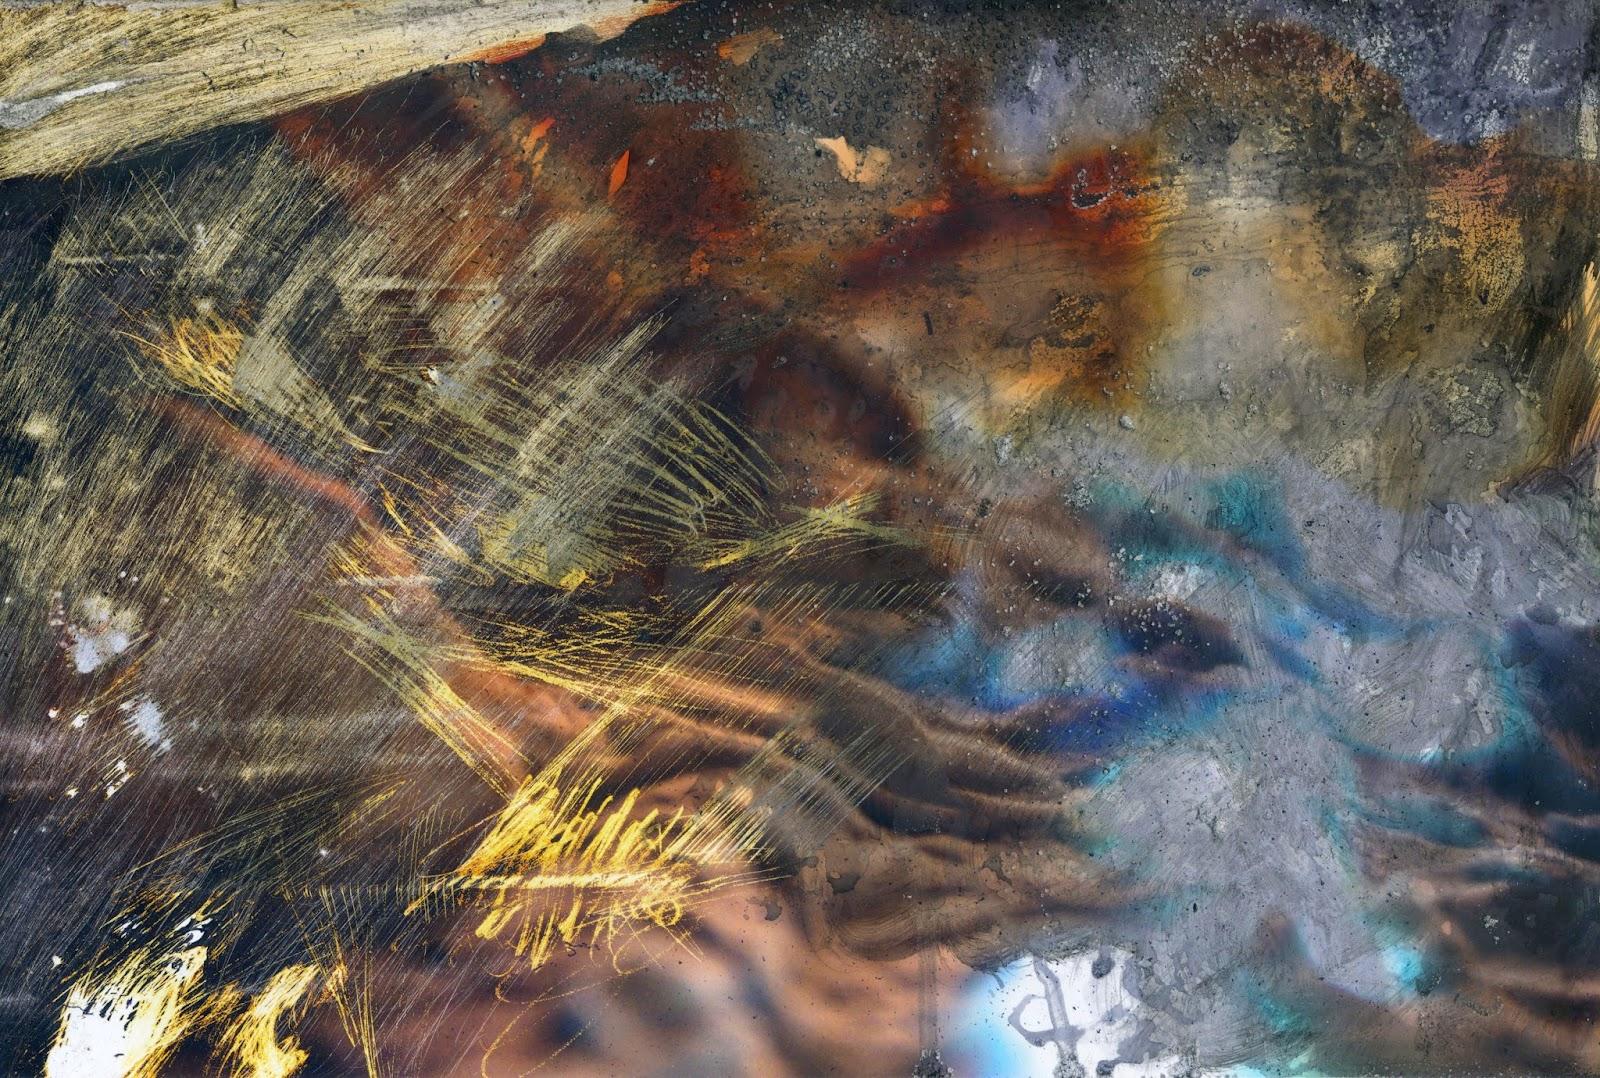 Expanded Small World, Detail Photographs, ink, gouache, salt 2014